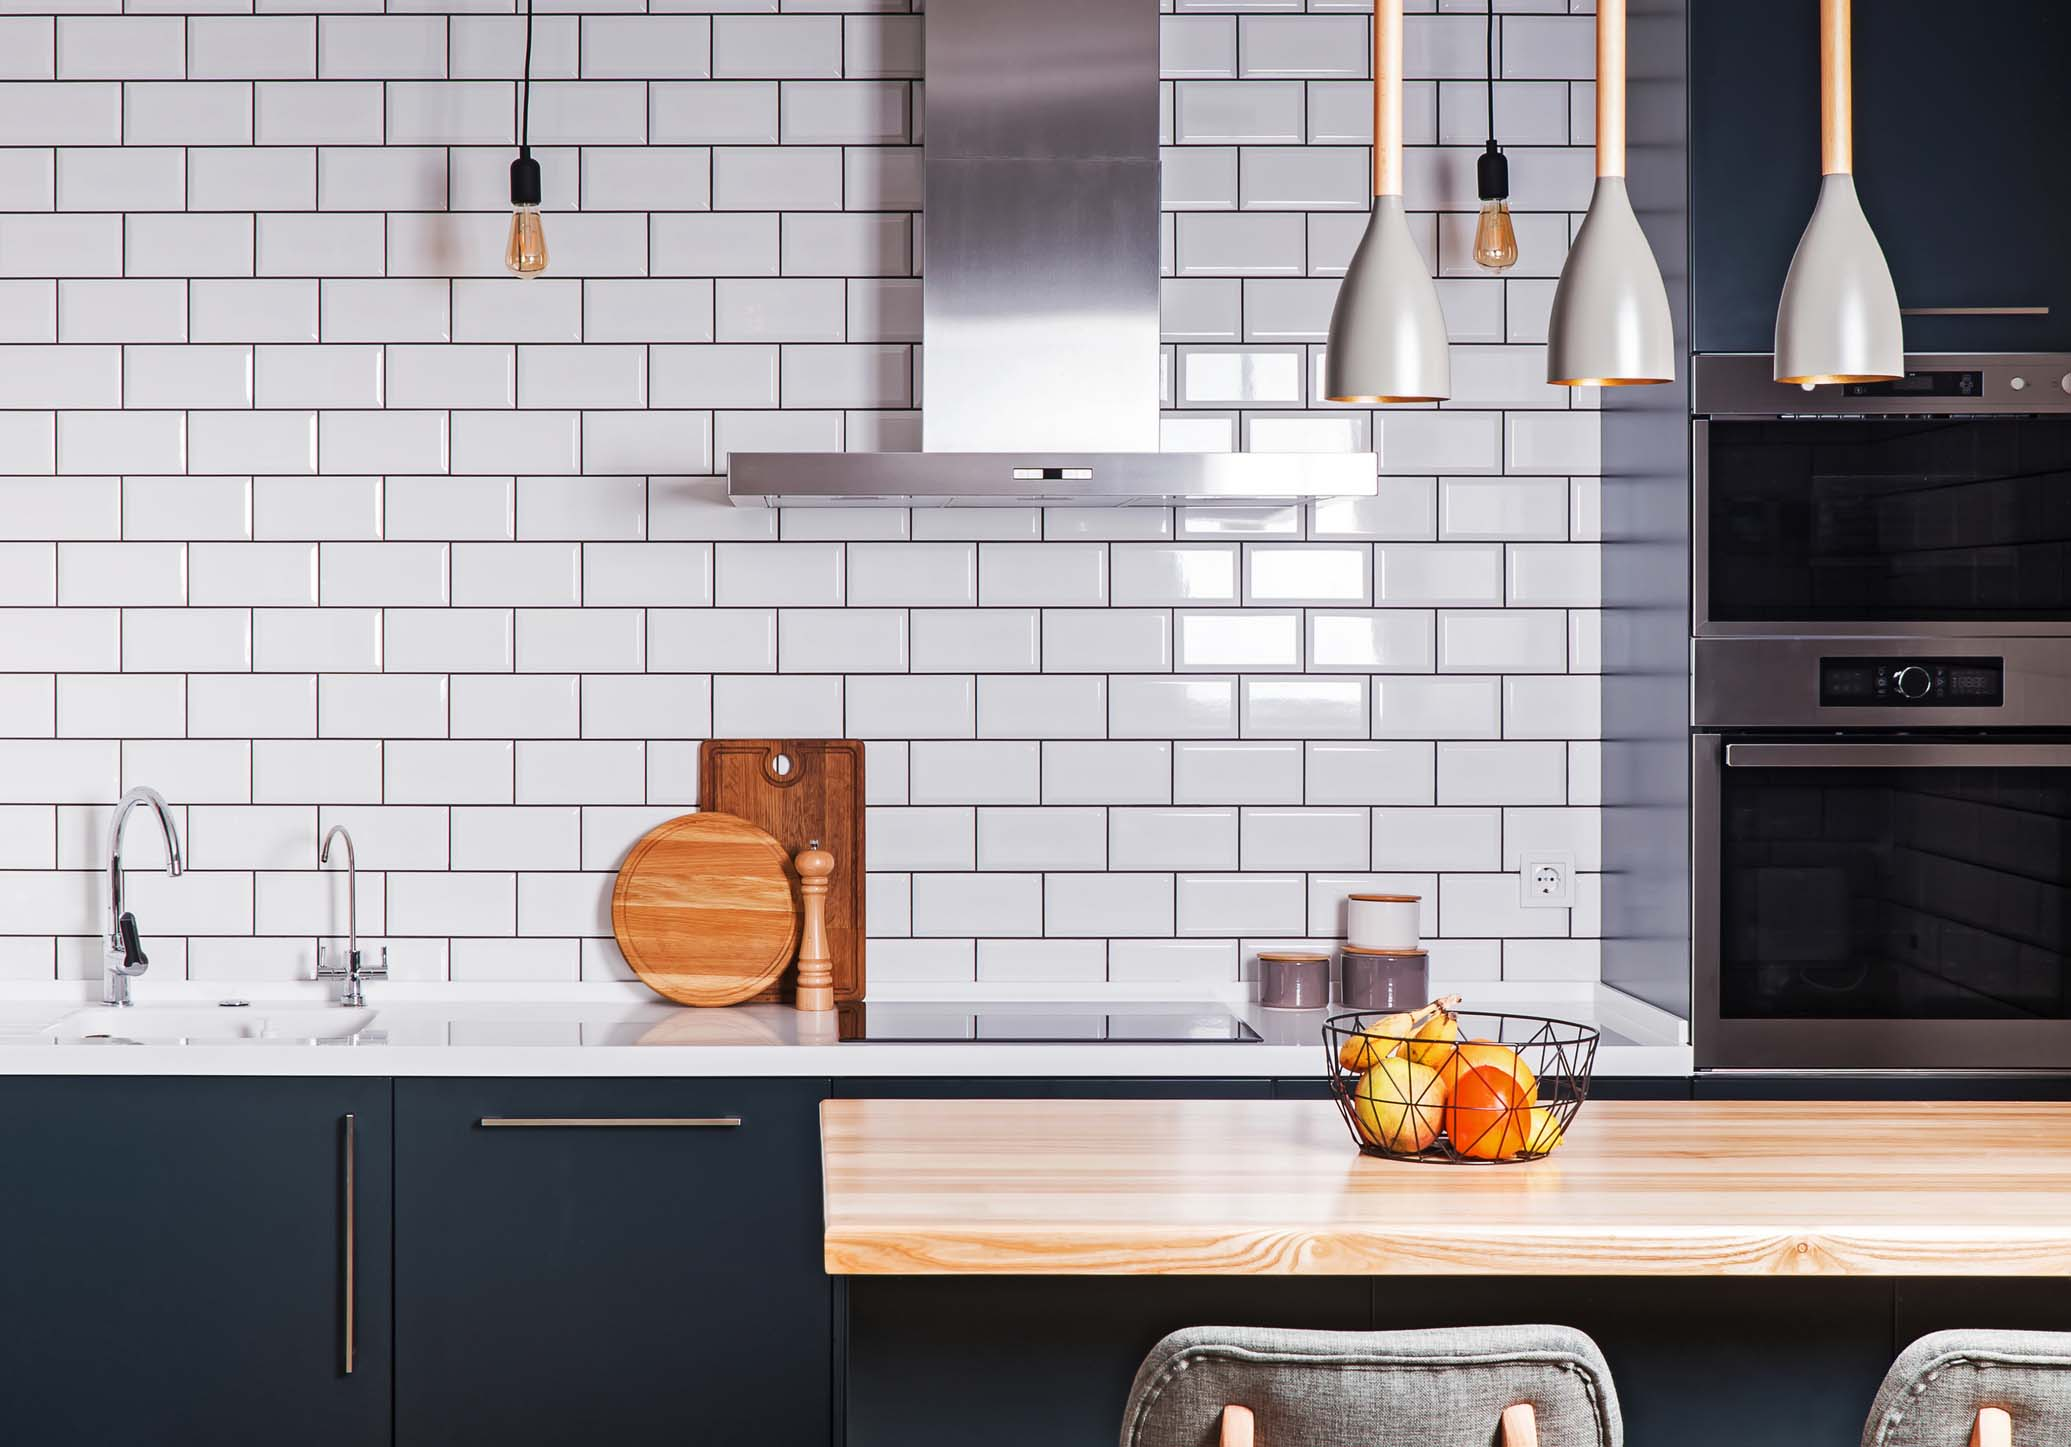 White subway tile backsplash in a kitchen